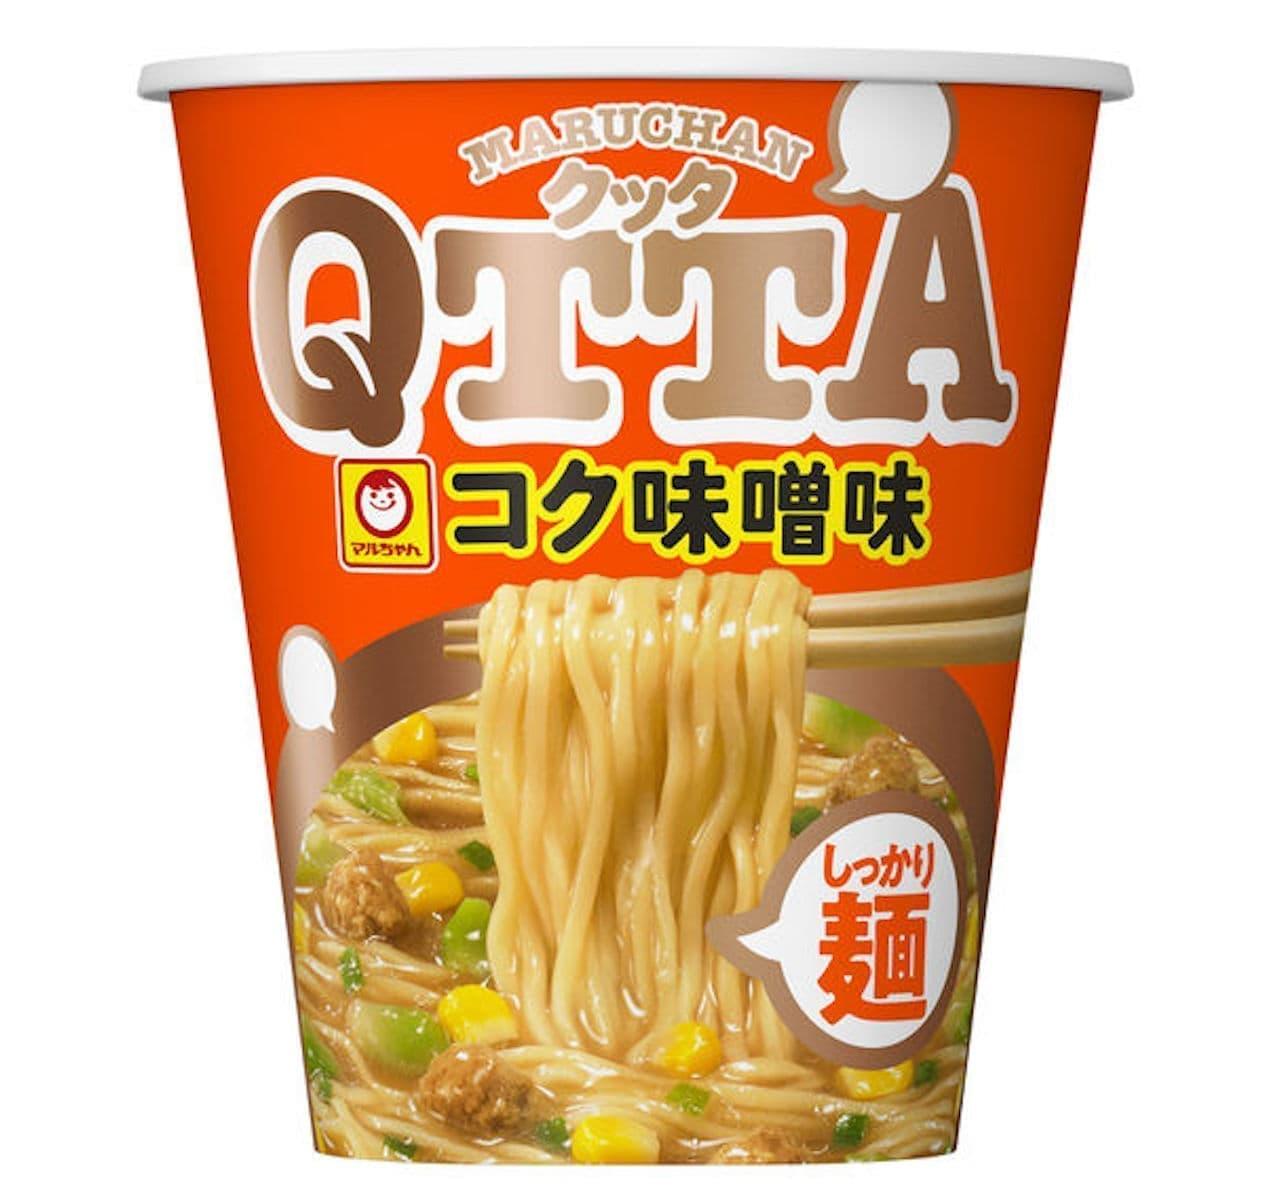 「MARUCHAN QTTA コク味噌味」濃厚なスープがクセになる一杯